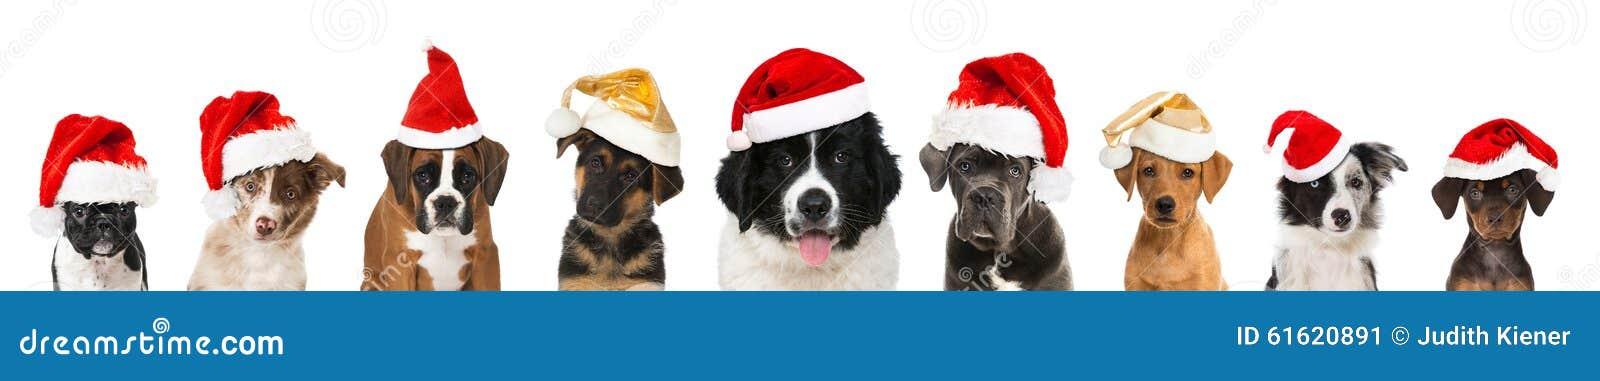 Perritos de la Navidad